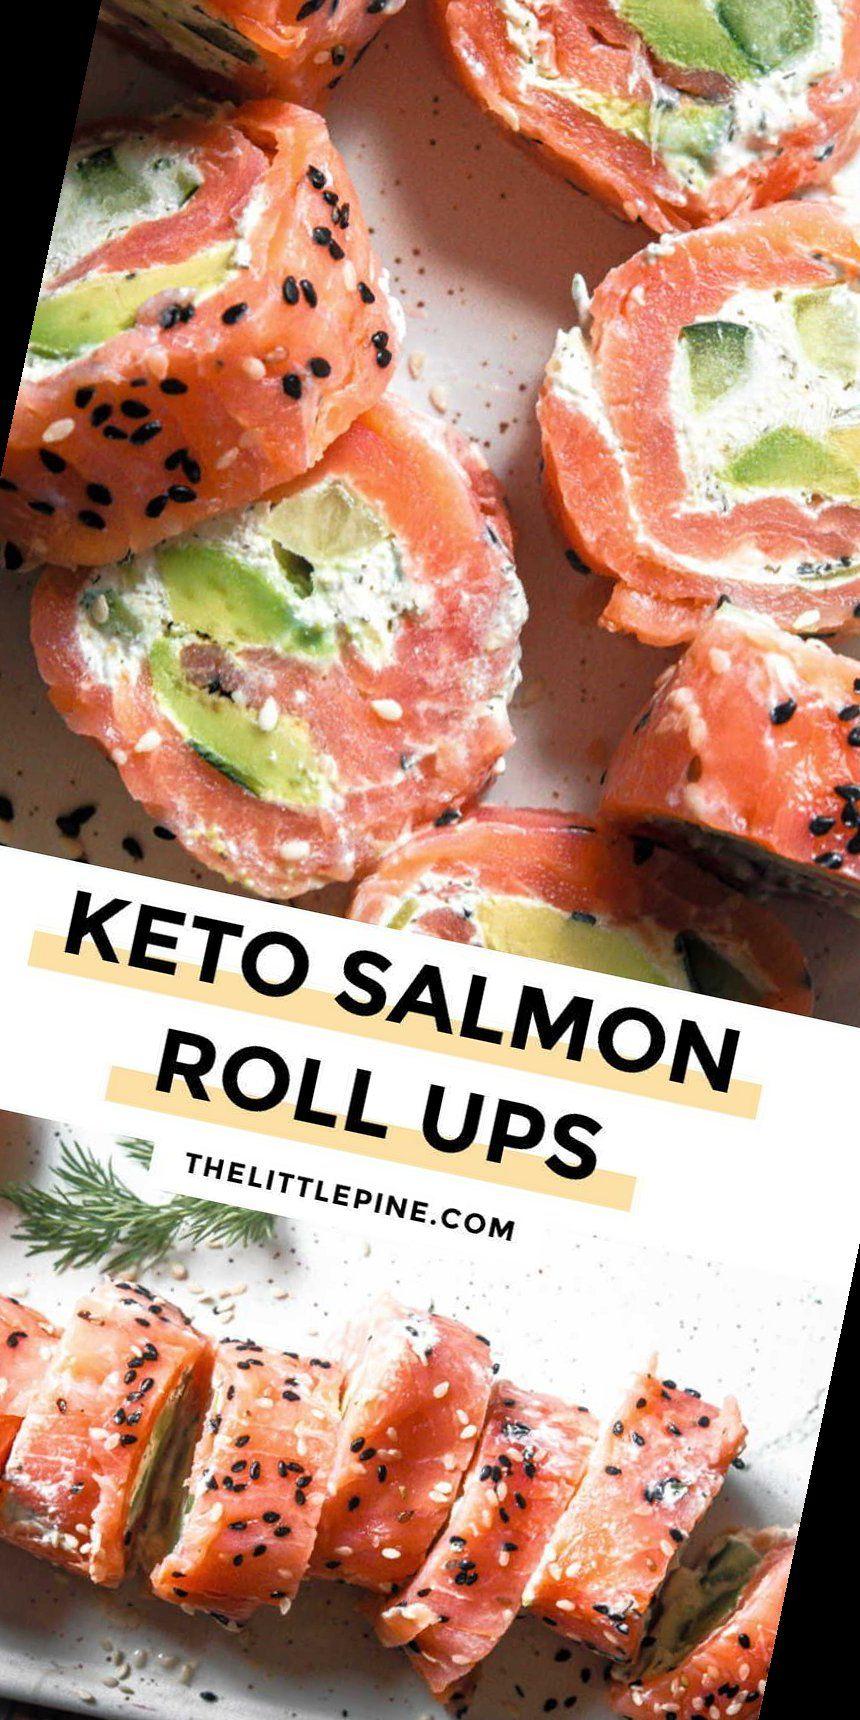 44+ Smoked Salmon Roll Ups | Keto Breakfast | 2020